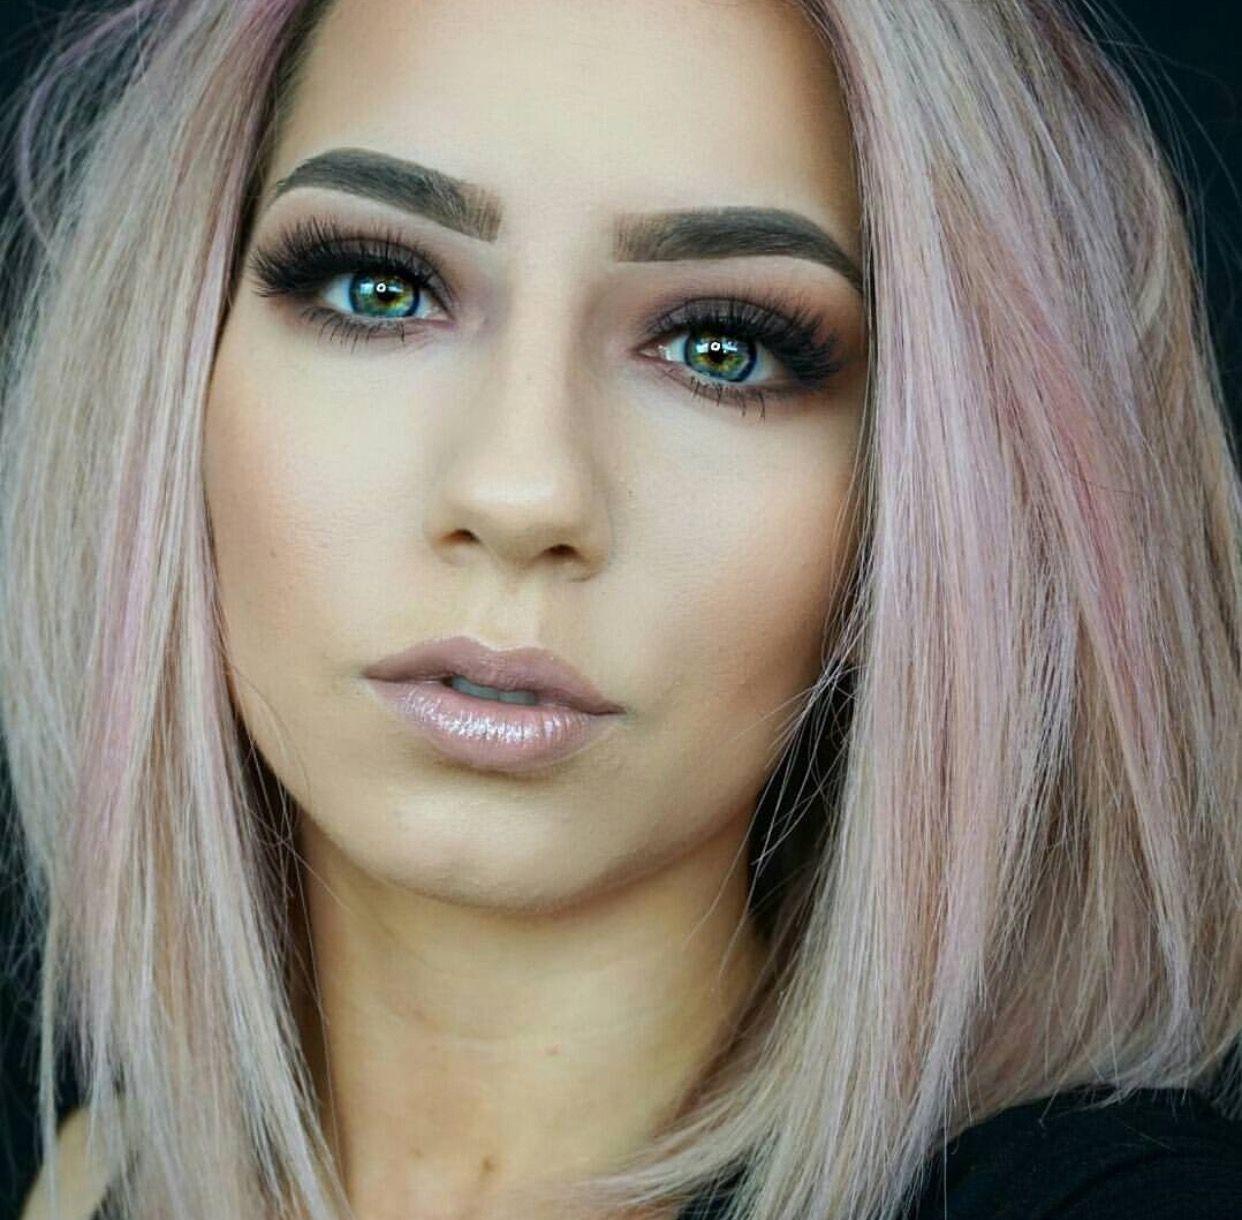 Hair Color For Fair Skin, Krystal